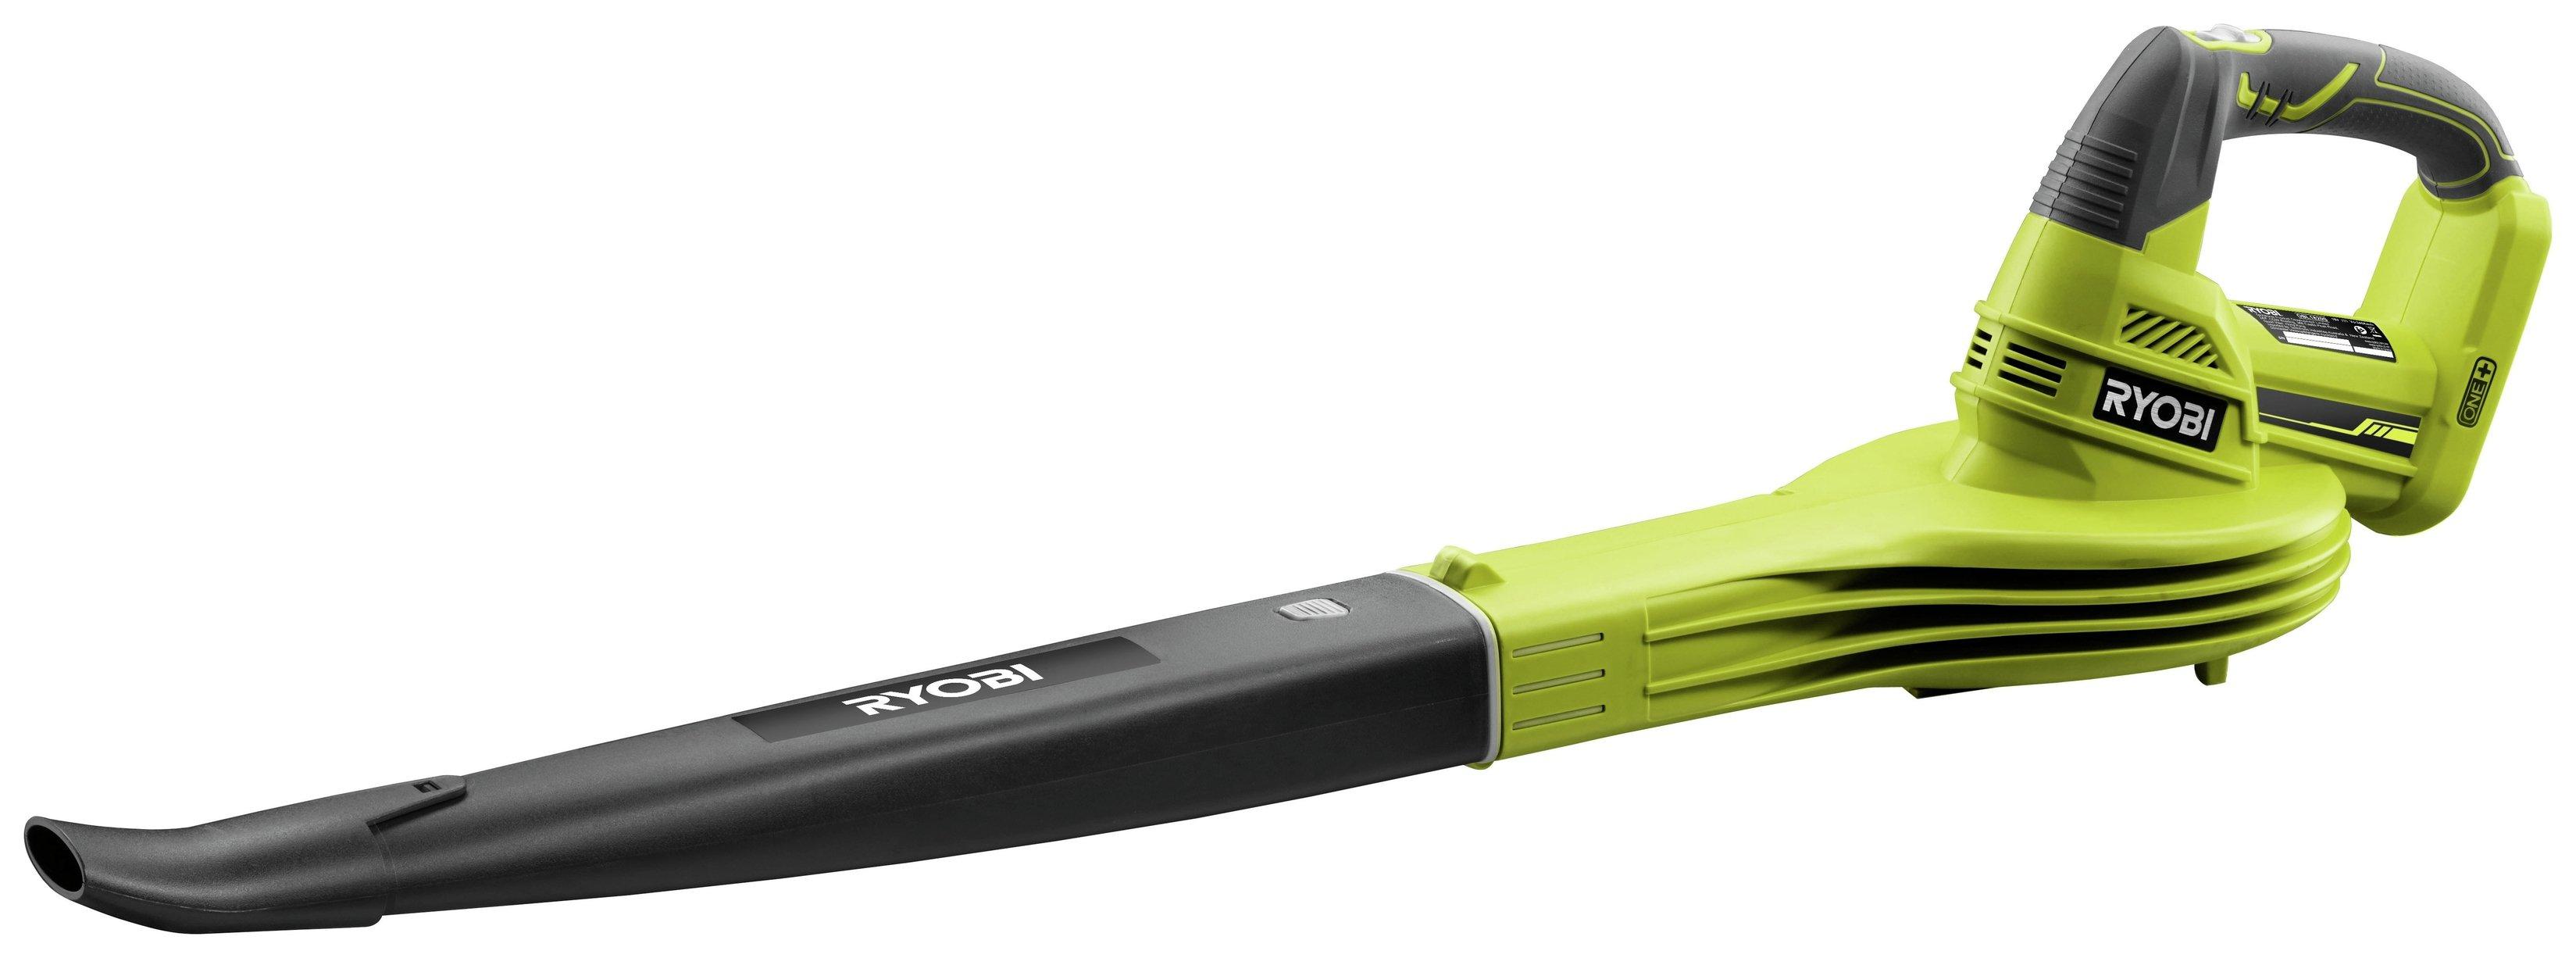 Ryobi OBL1820S Bare Leaf Blower - No Battery.